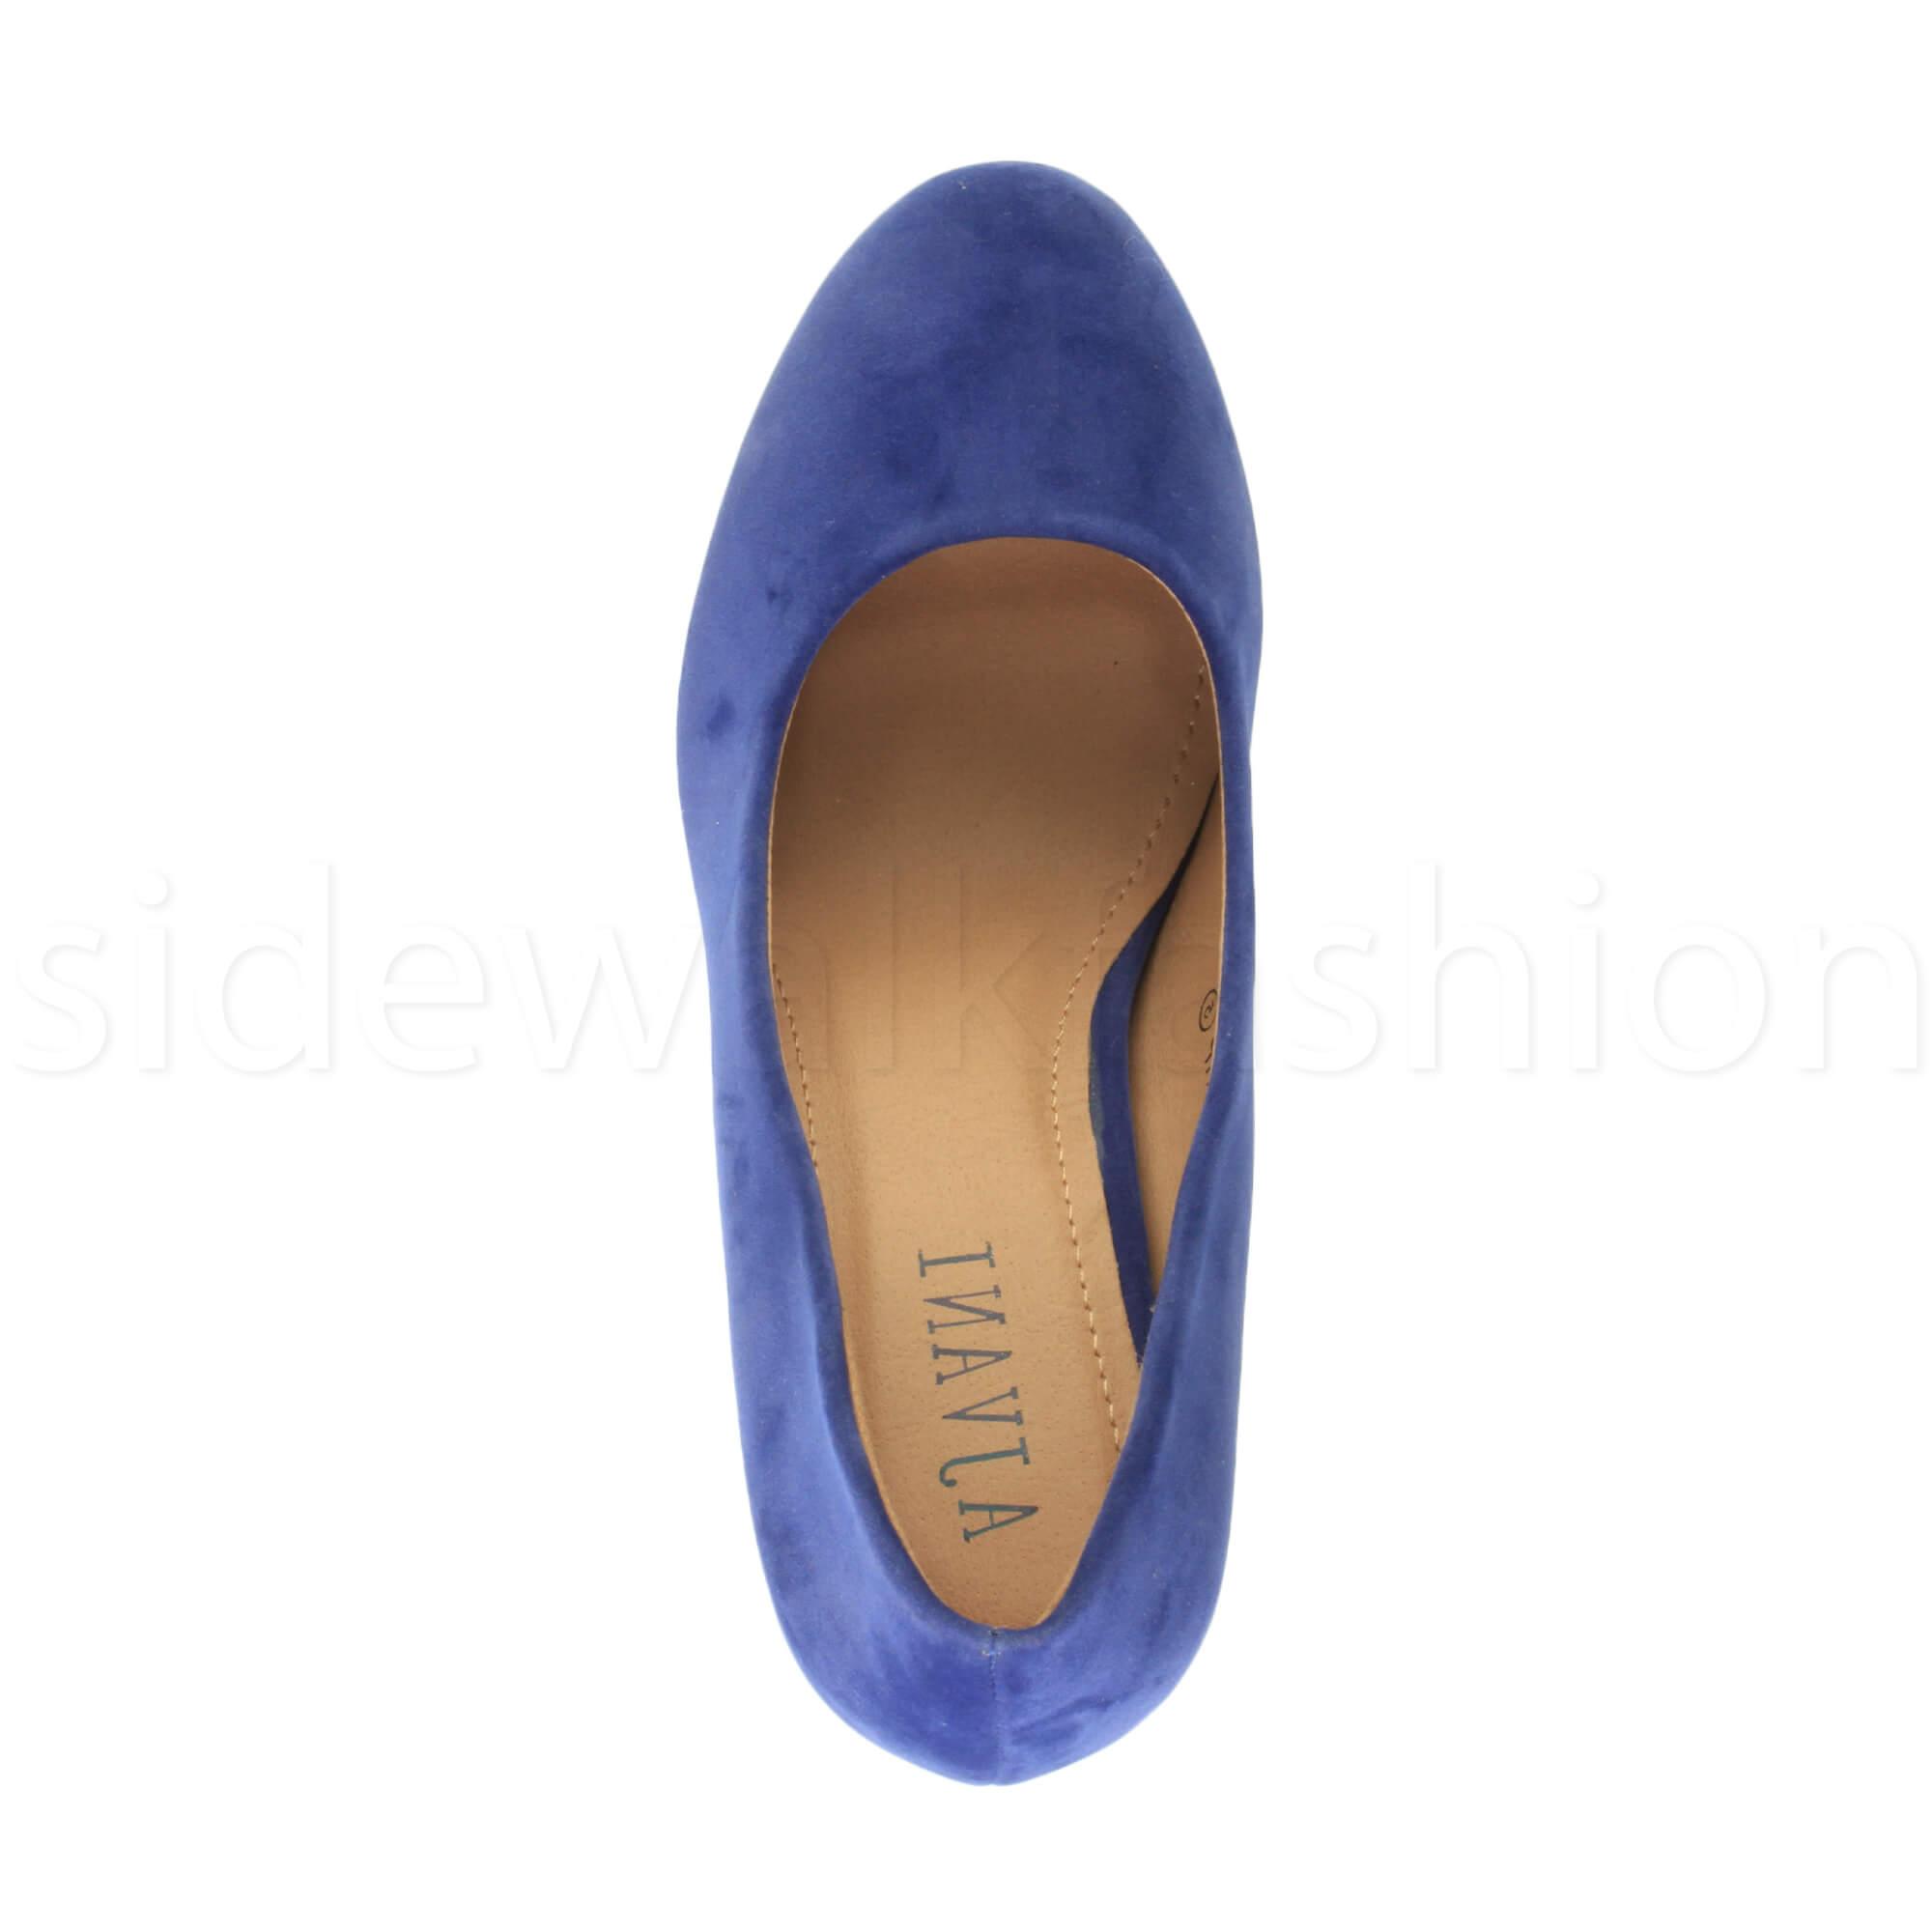 Womens-ladies-high-mid-heel-platform-wedding-evening-bridesmaid-court-shoes-size thumbnail 49